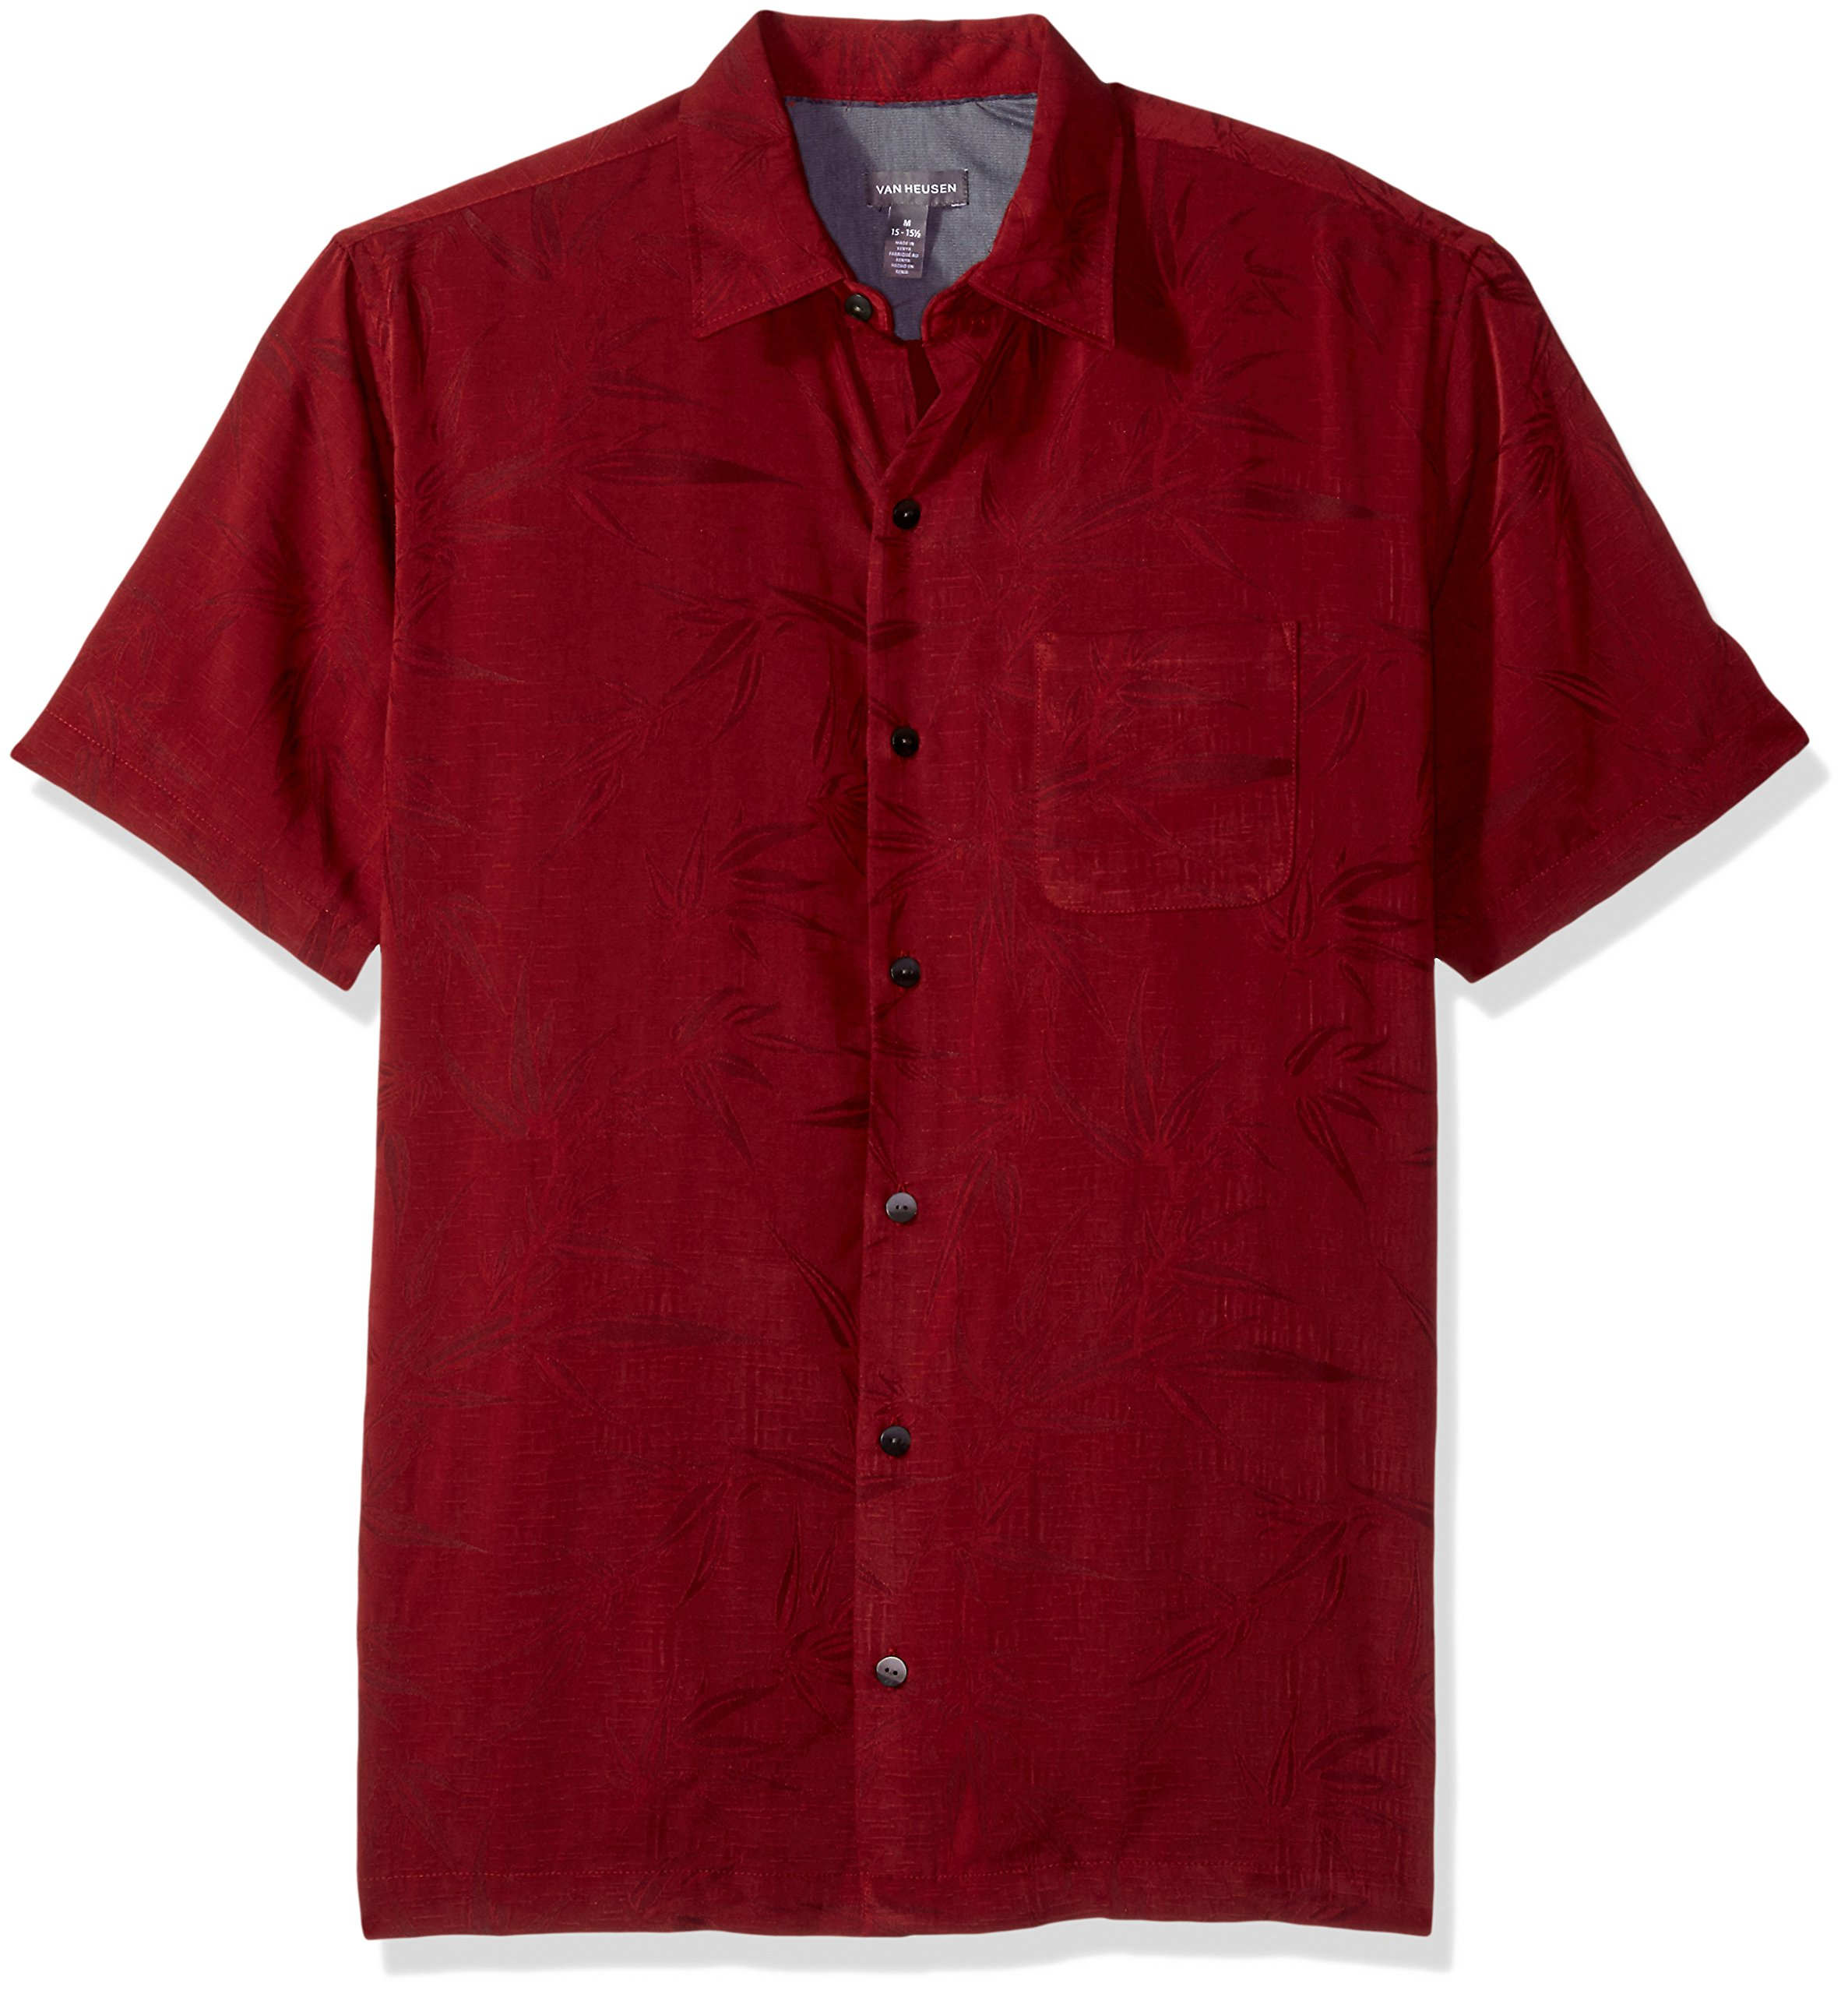 725b9e09 Van Heusen Men's Air Tropical Short Sleeve Button Down Poly Rayon Shirt,  Print Canernet,